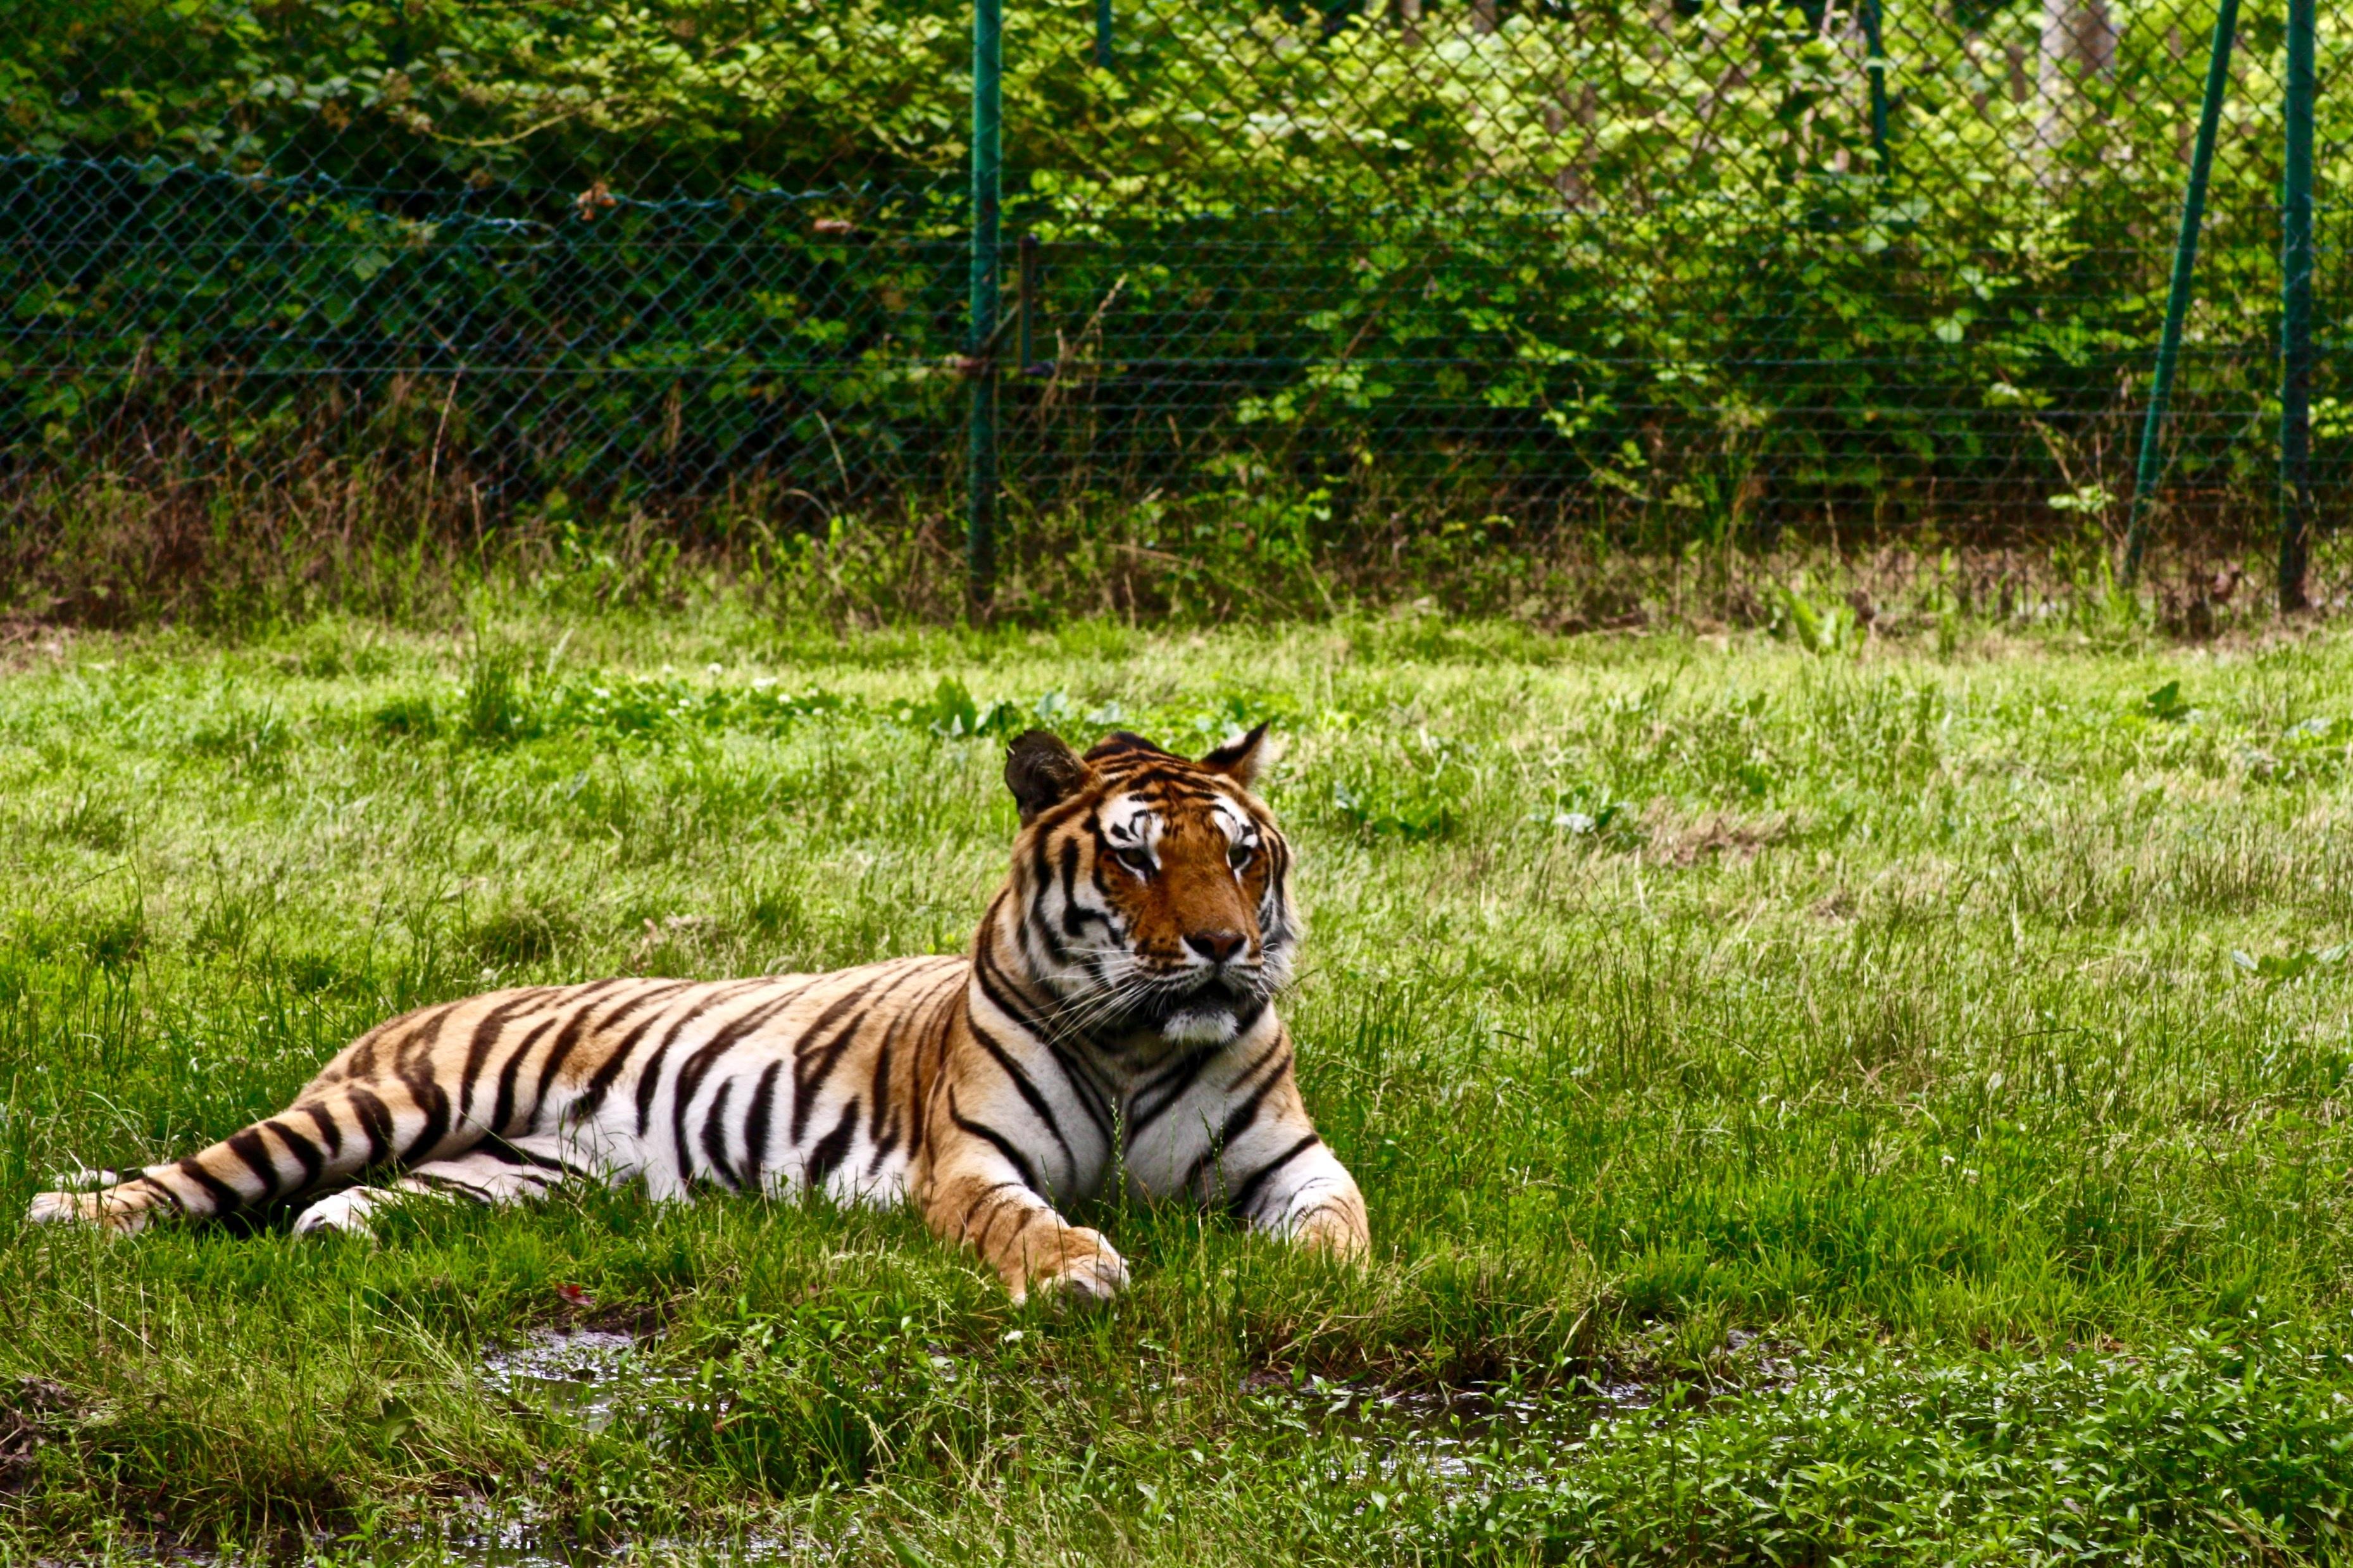 Fotos Animales Selva Animales De La Selva Azucar Flor